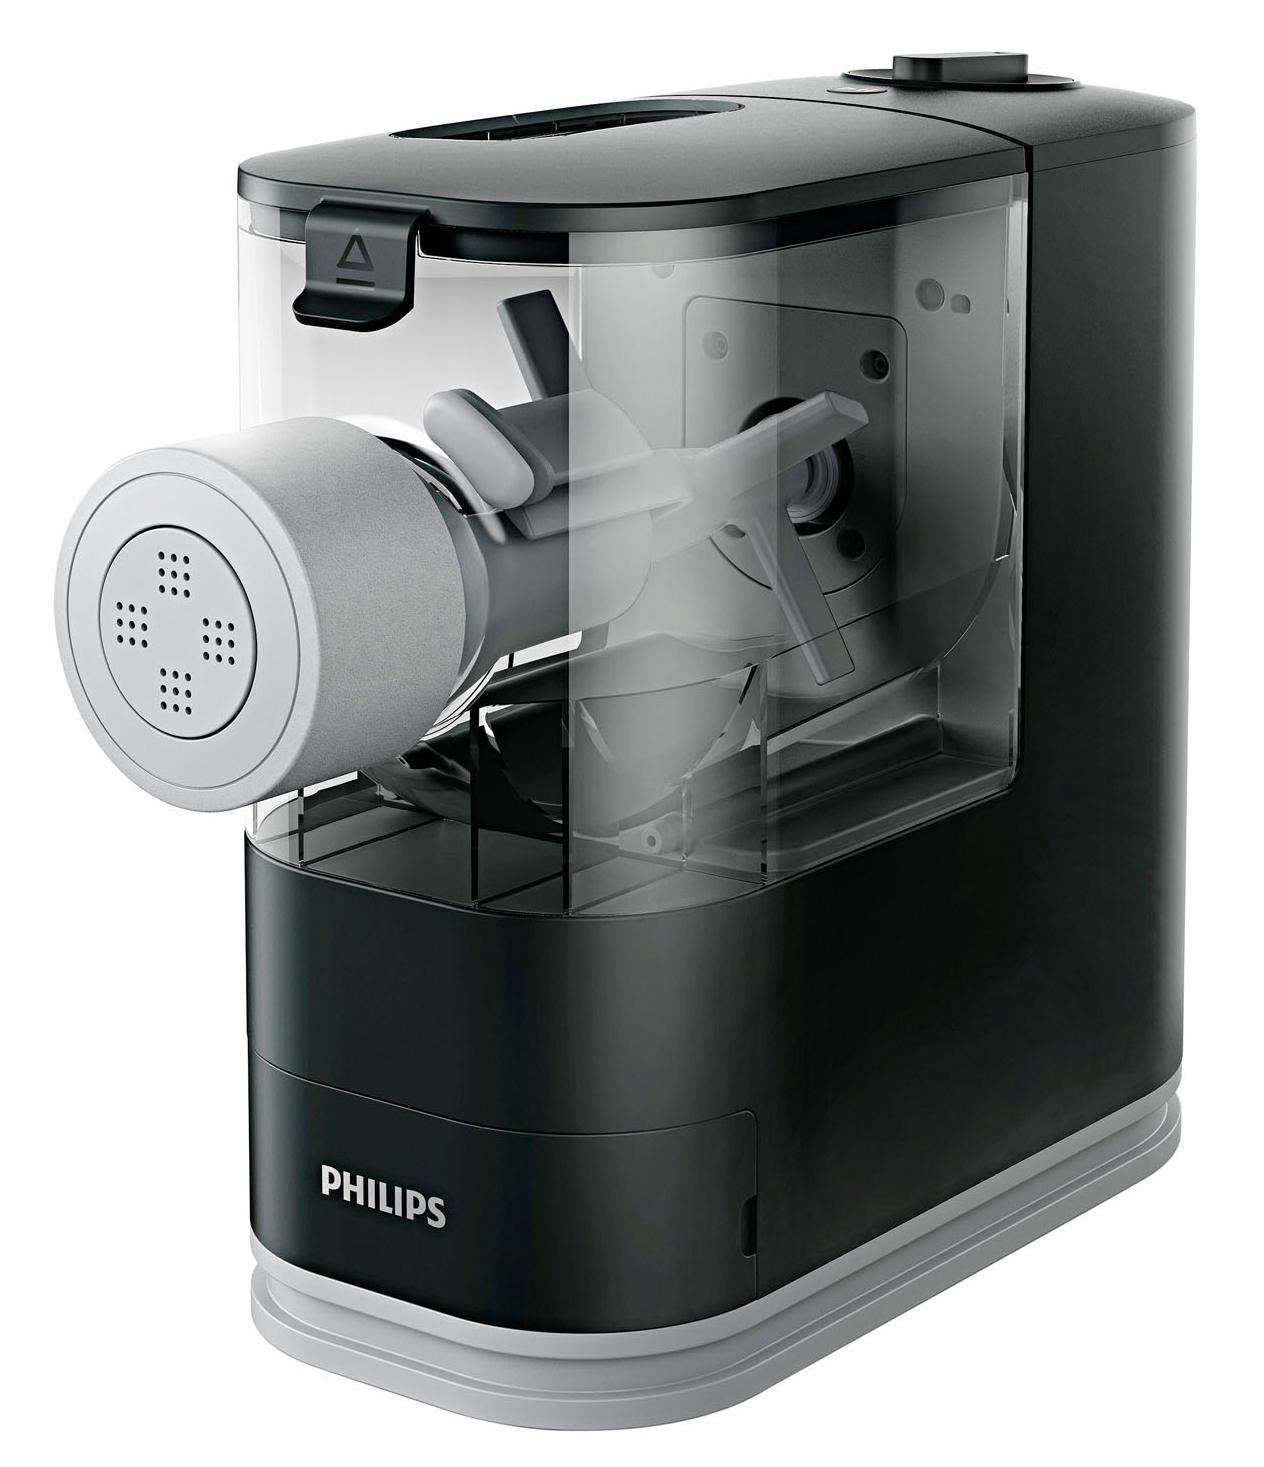 phillips compact pasta maker